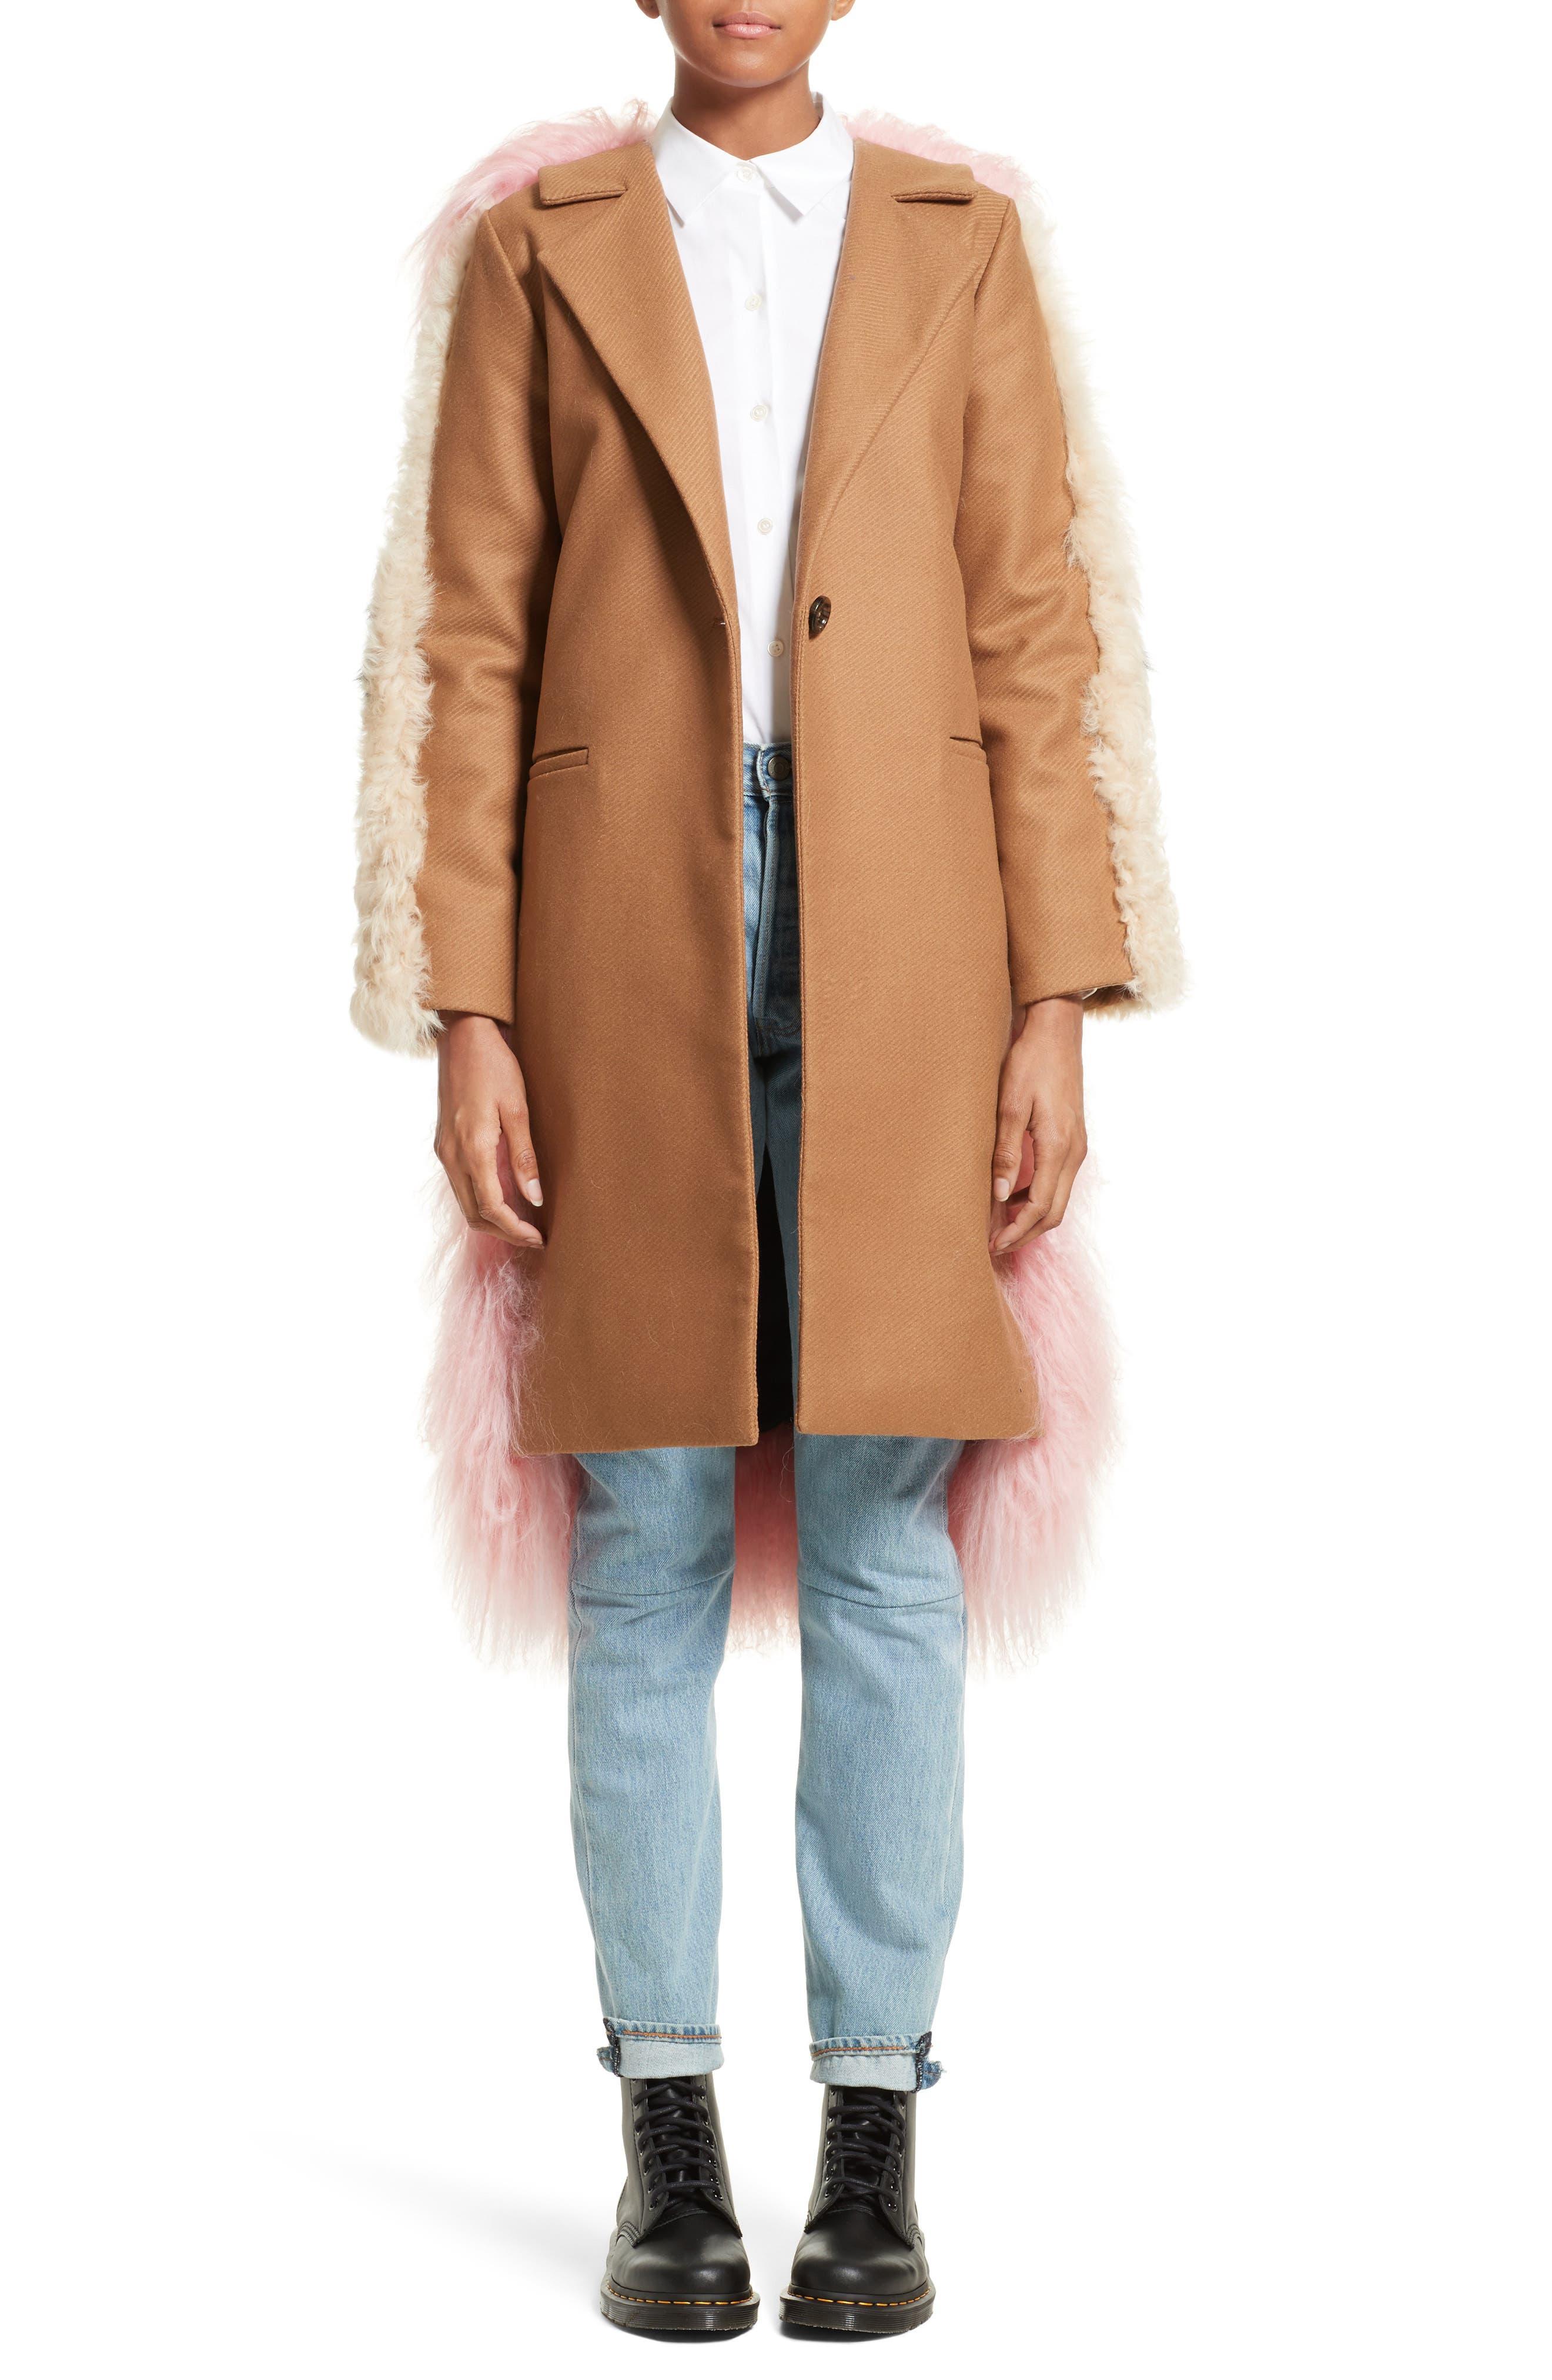 Mingo Wool Blend & Genuine Shearling Coat,                             Main thumbnail 1, color,                             250